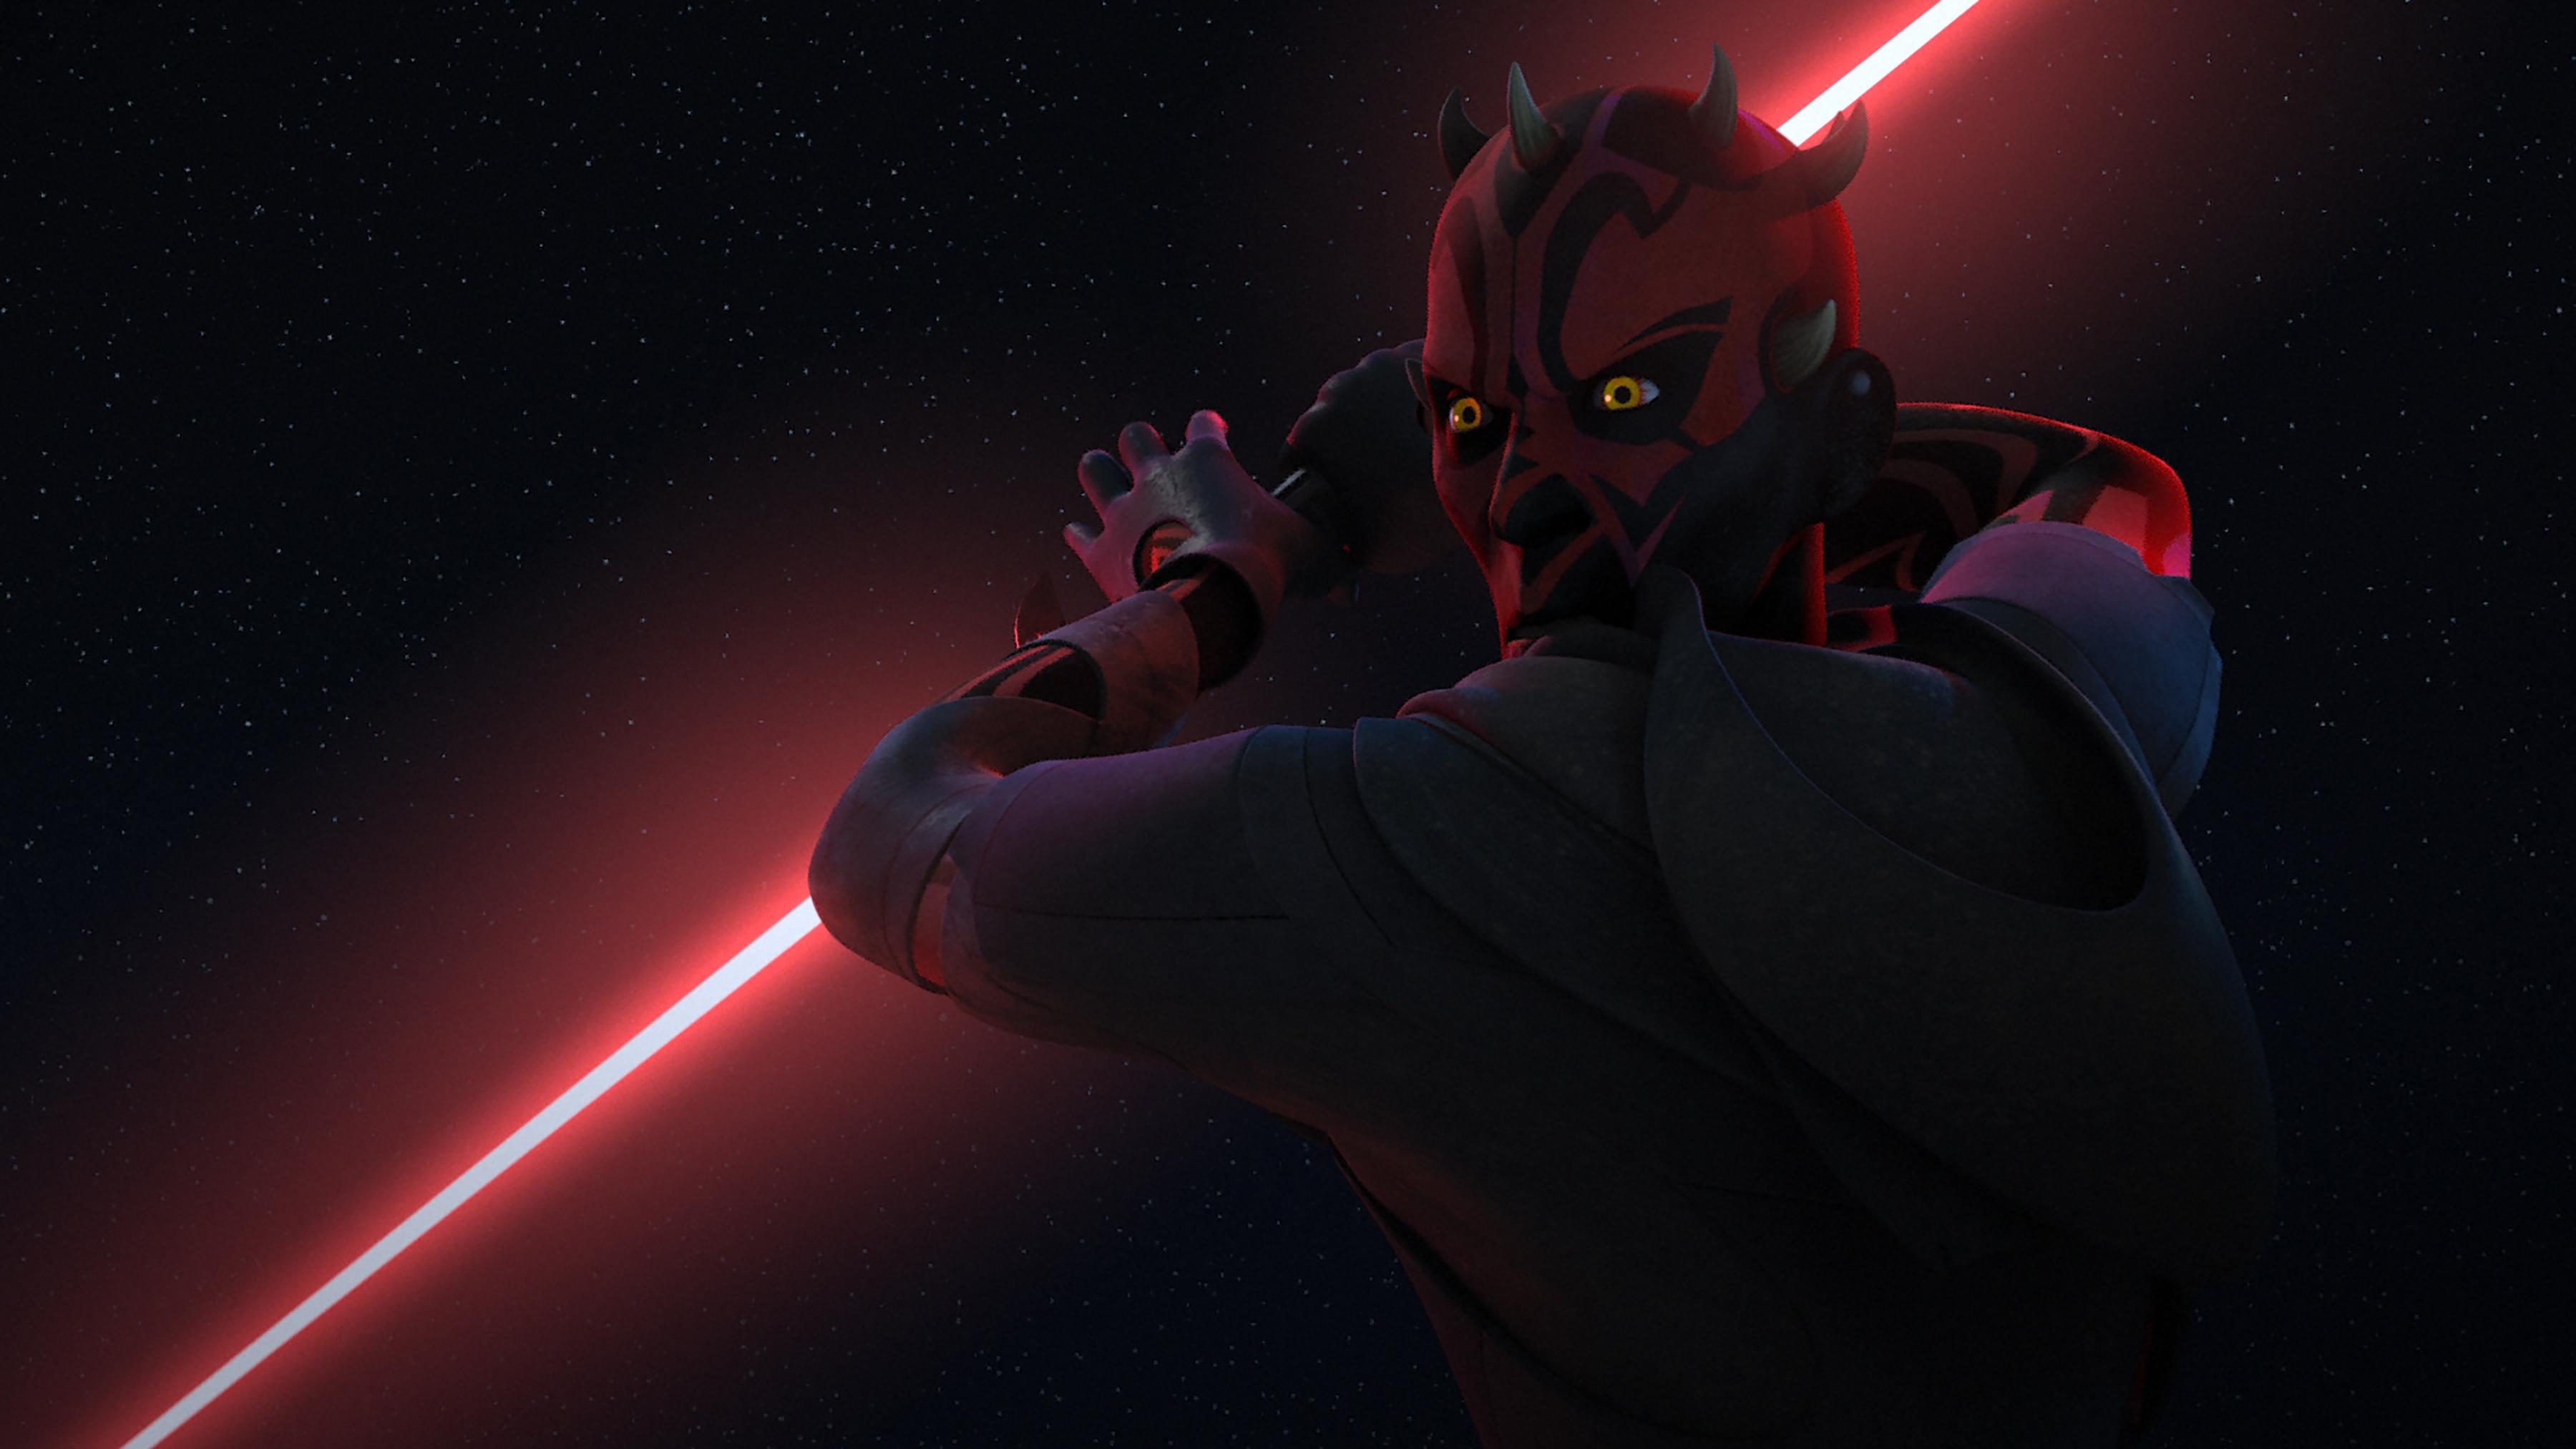 Clone Wars Season 7: The Plotlines The Star Wars Show Should